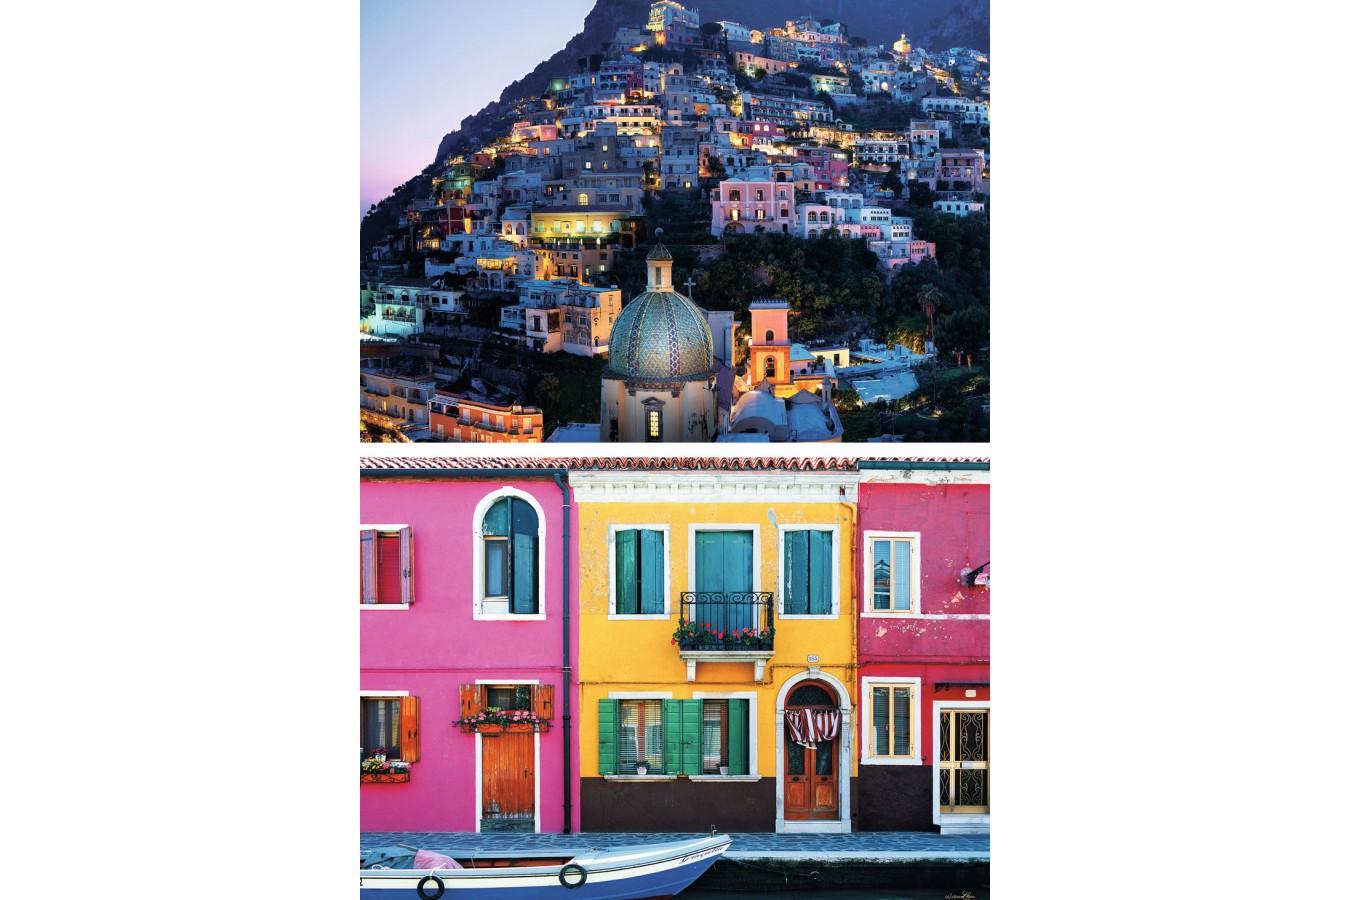 Pachet Promo Ravensburger Burano + Positano, 2x1.000 piese imagine